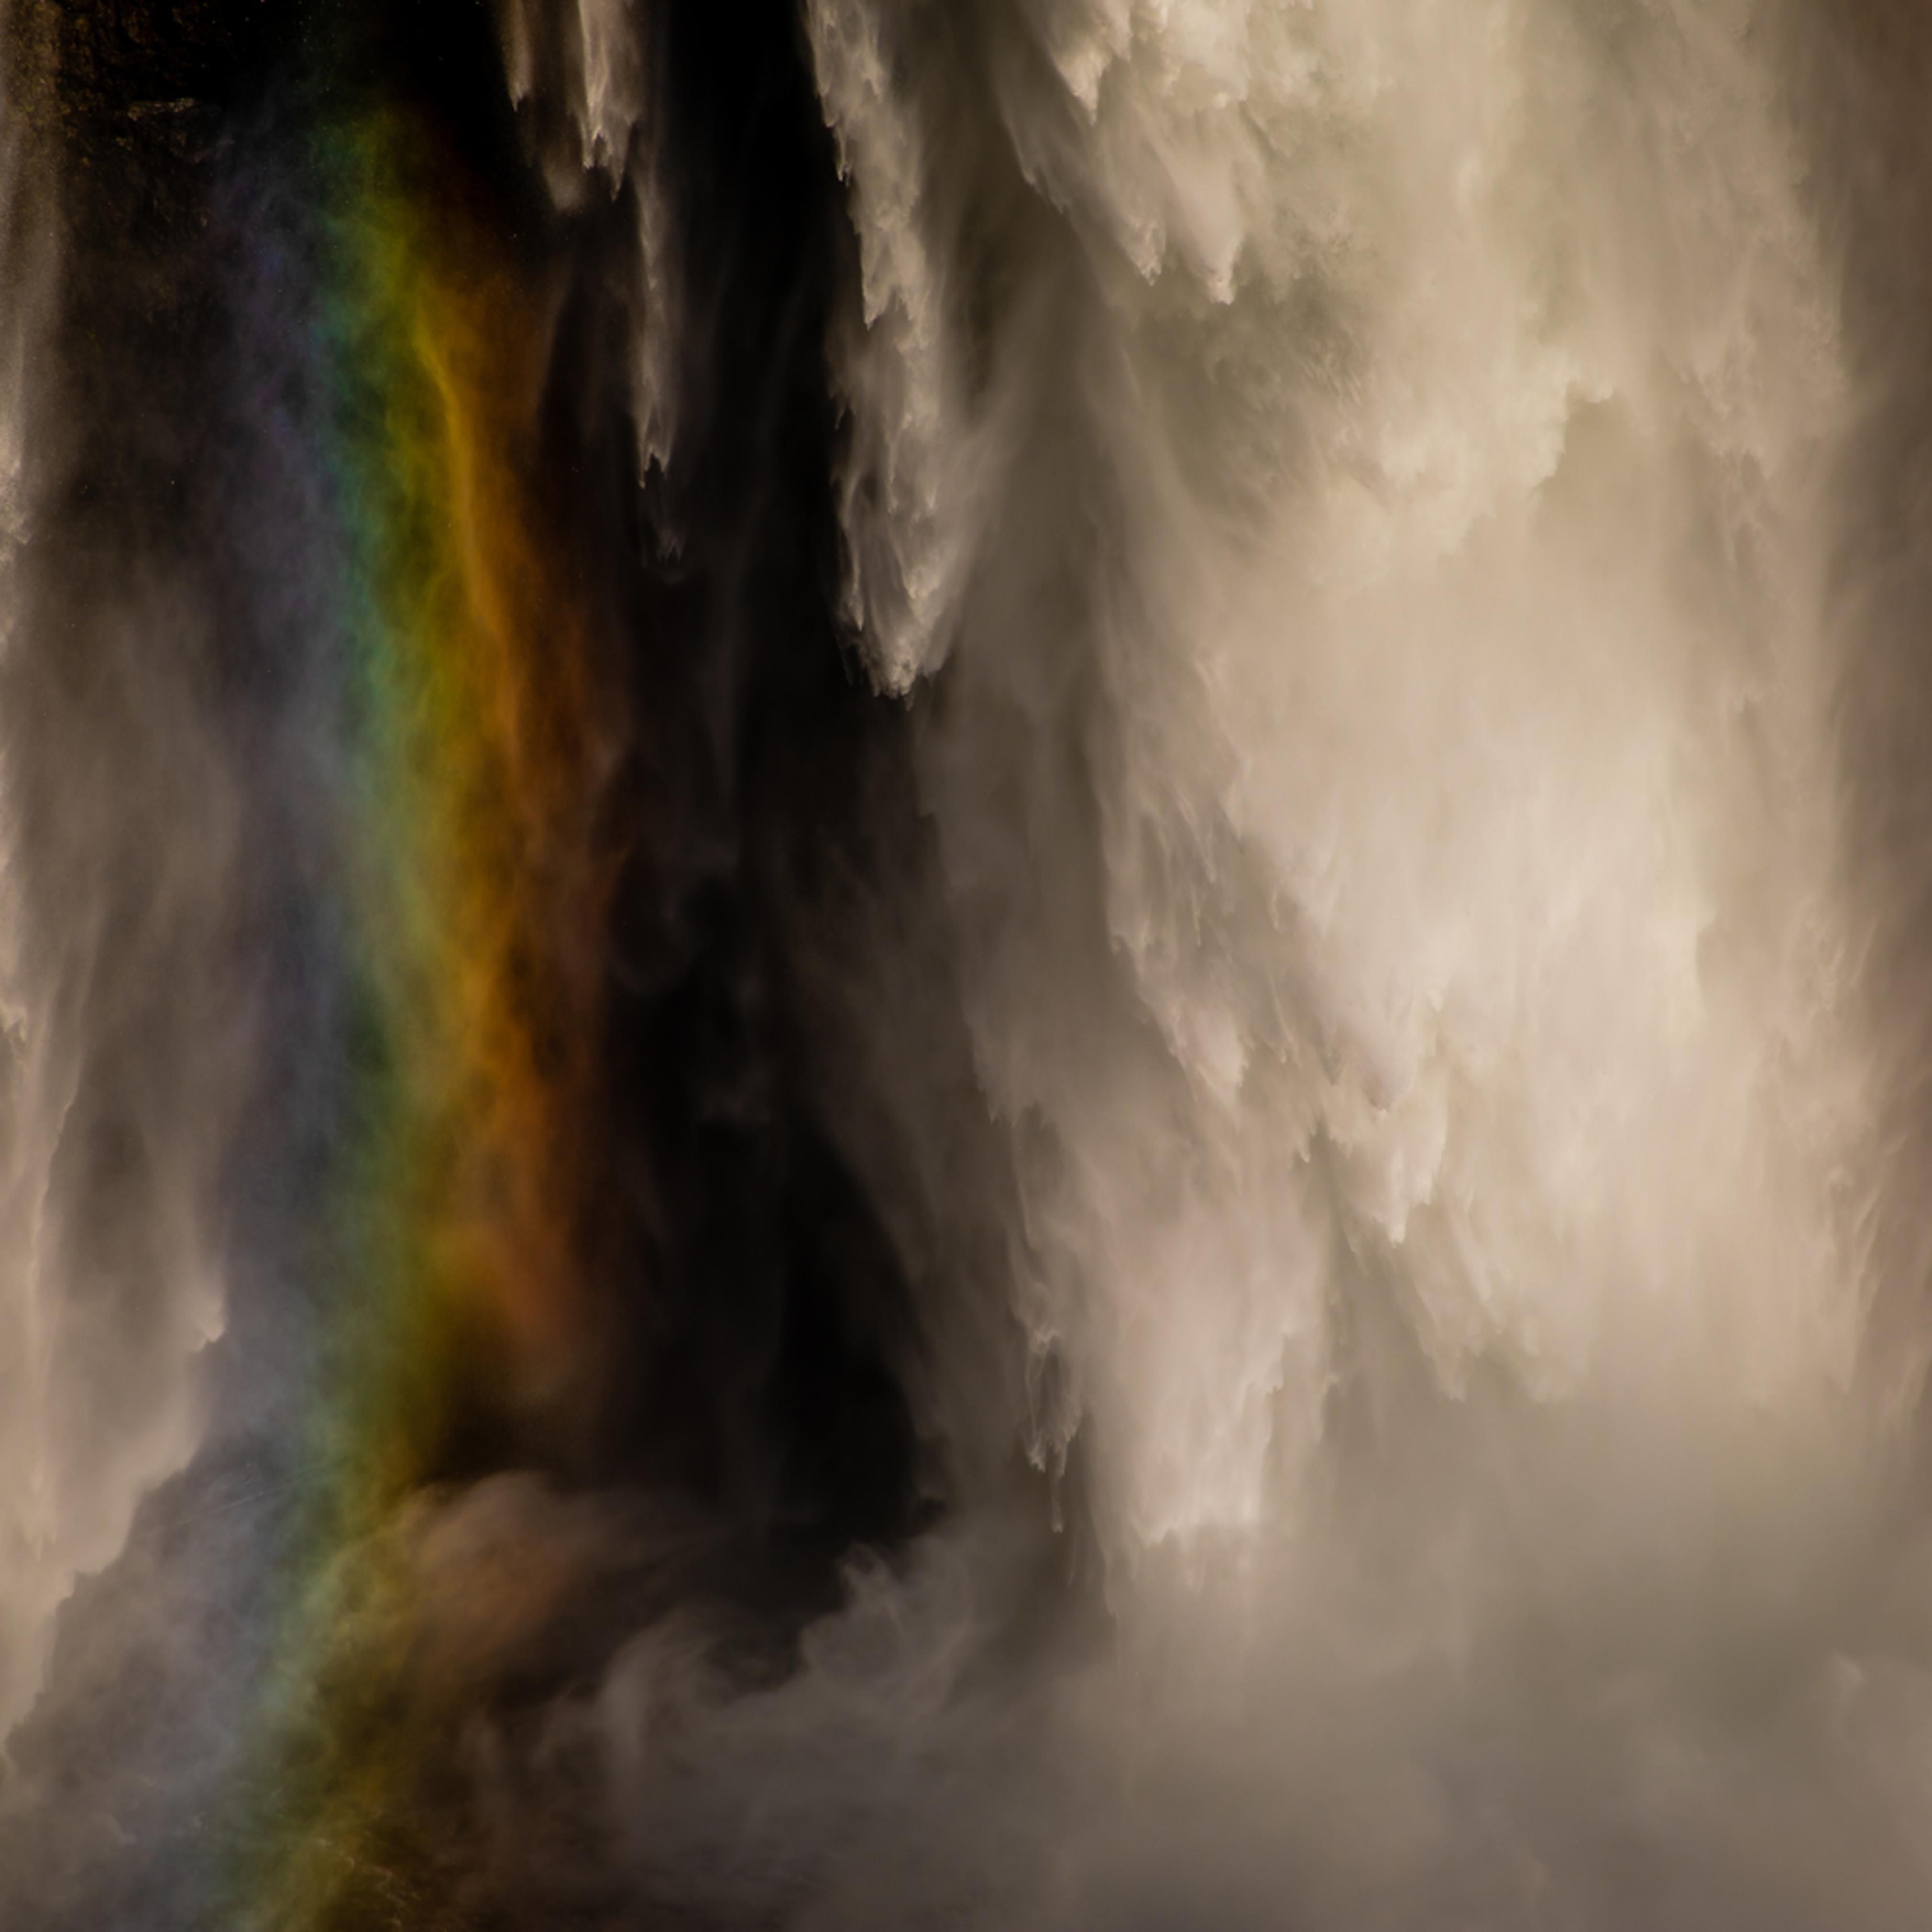 Snowqualmie rainbow xiozar